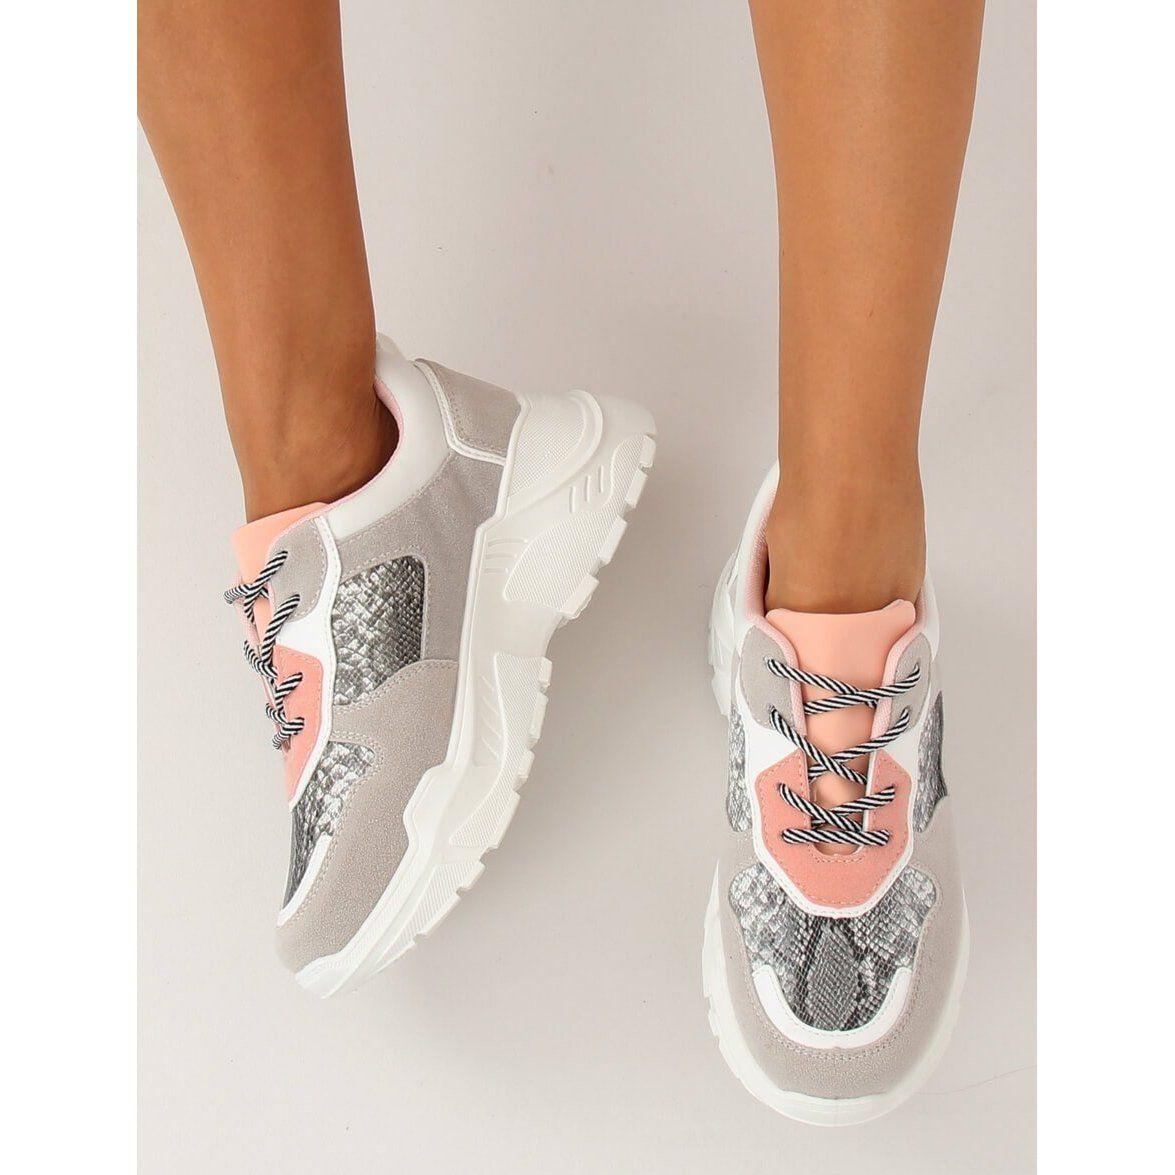 Buty Sportowe Szare Lv88p Snake Sports Shoes Shoes Womens Fashion